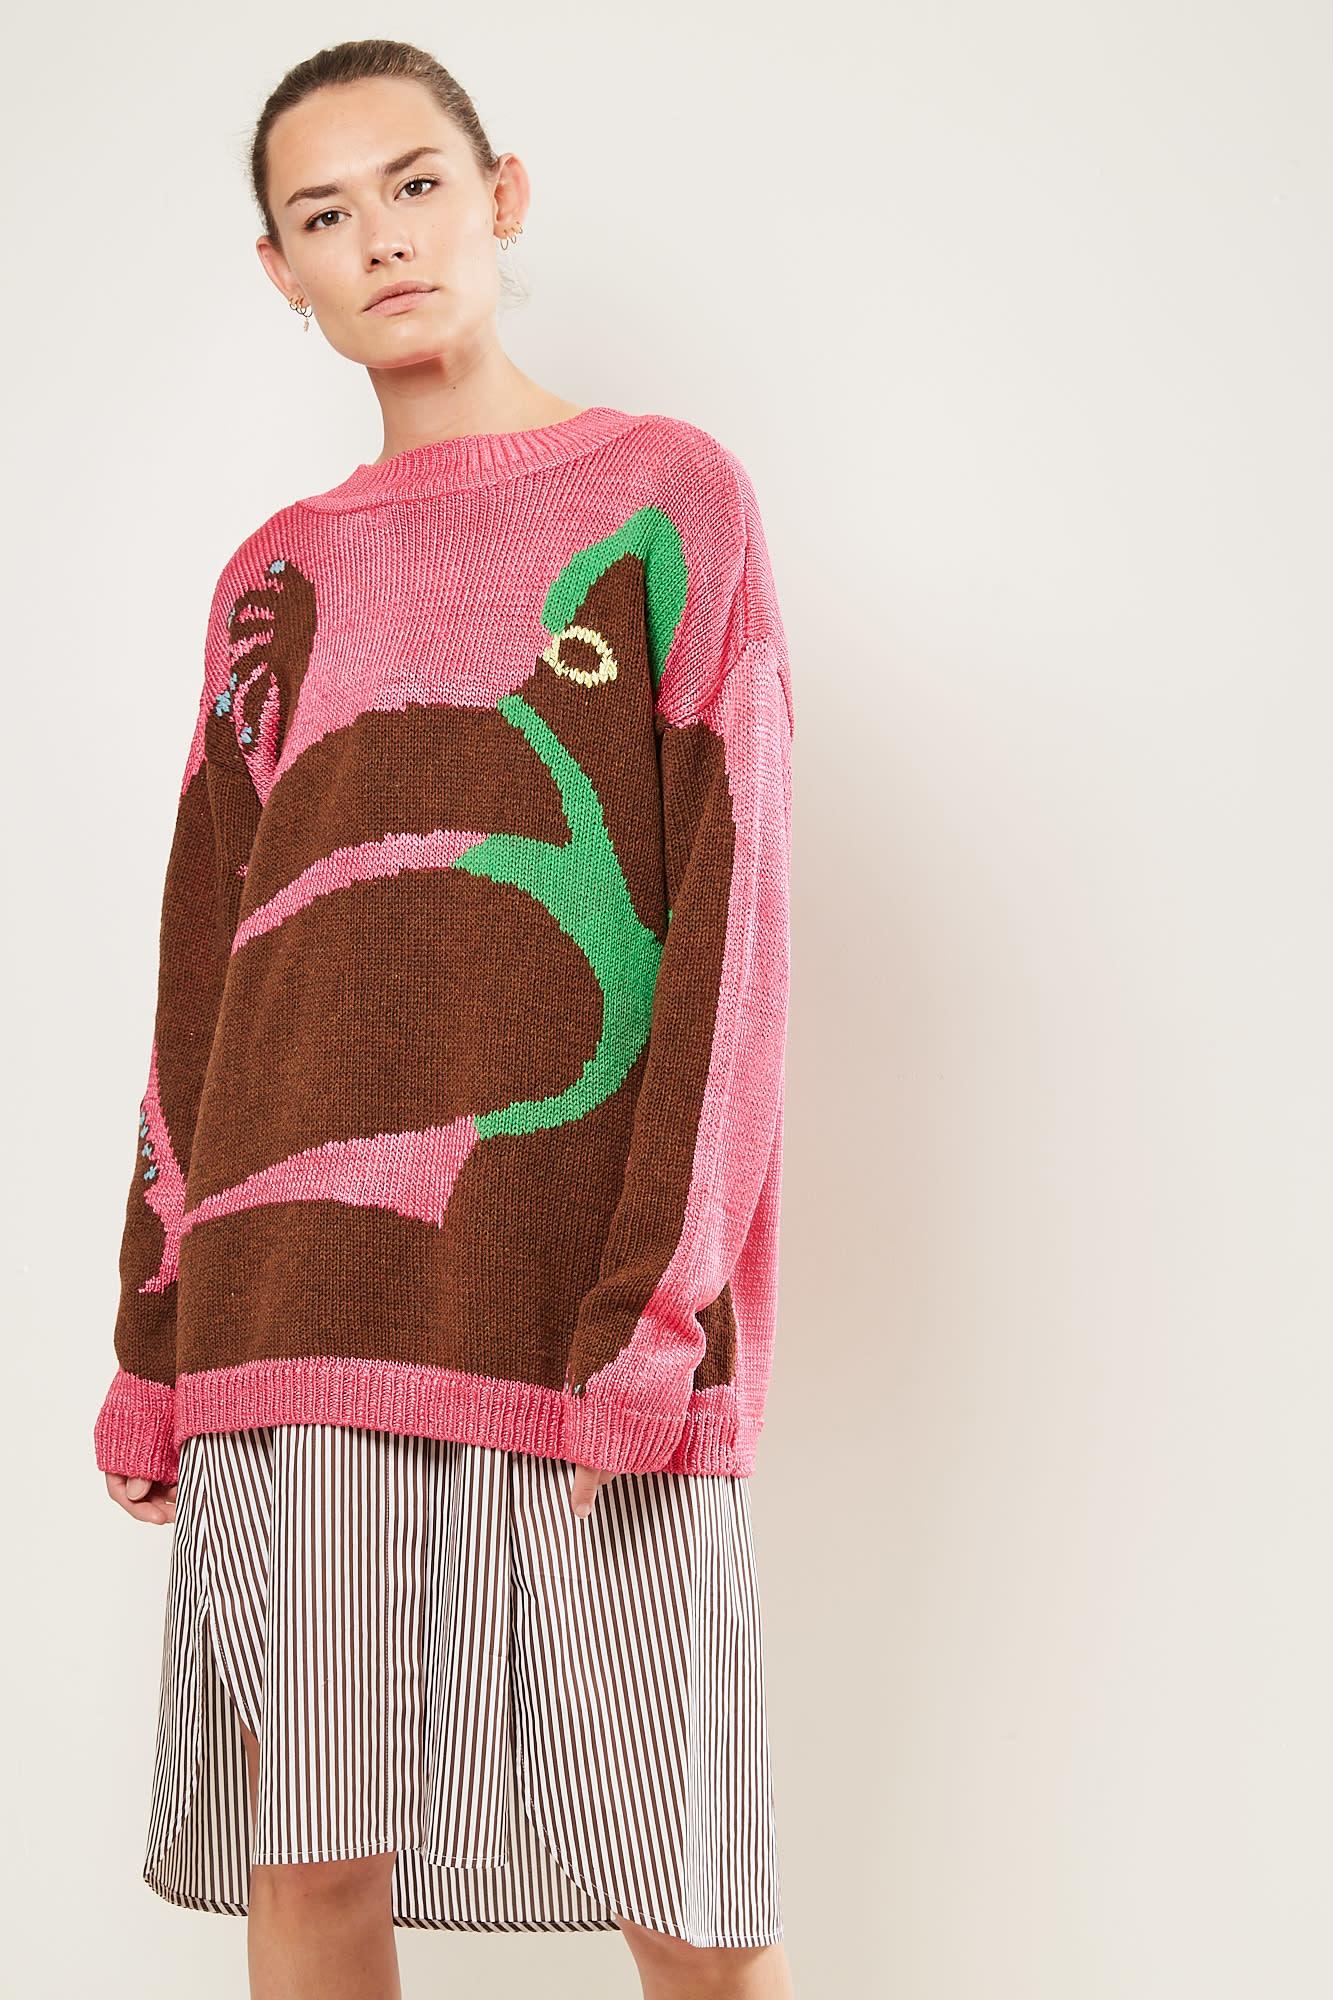 Survival of the fashionest - Amber big Vittoria's full bodies sweater